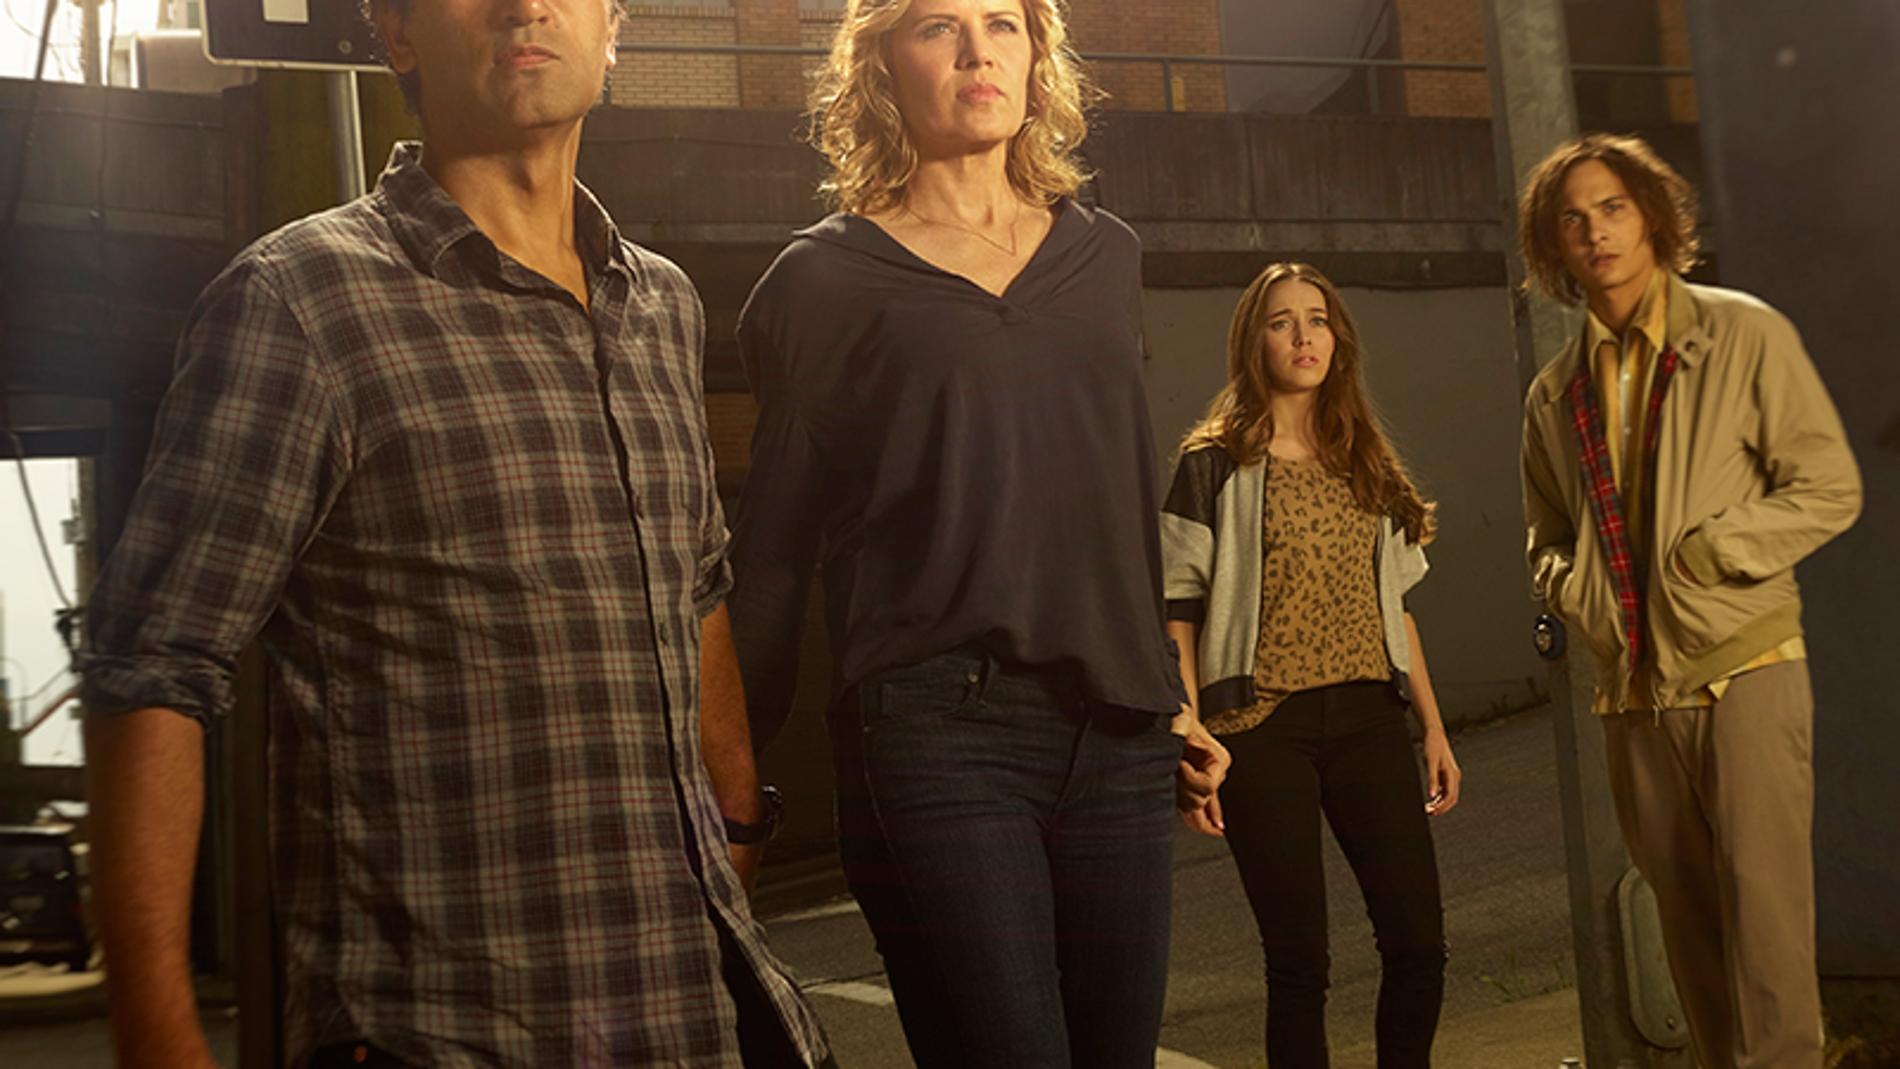 la familia protagonista de 'Fear The Walking Dead'